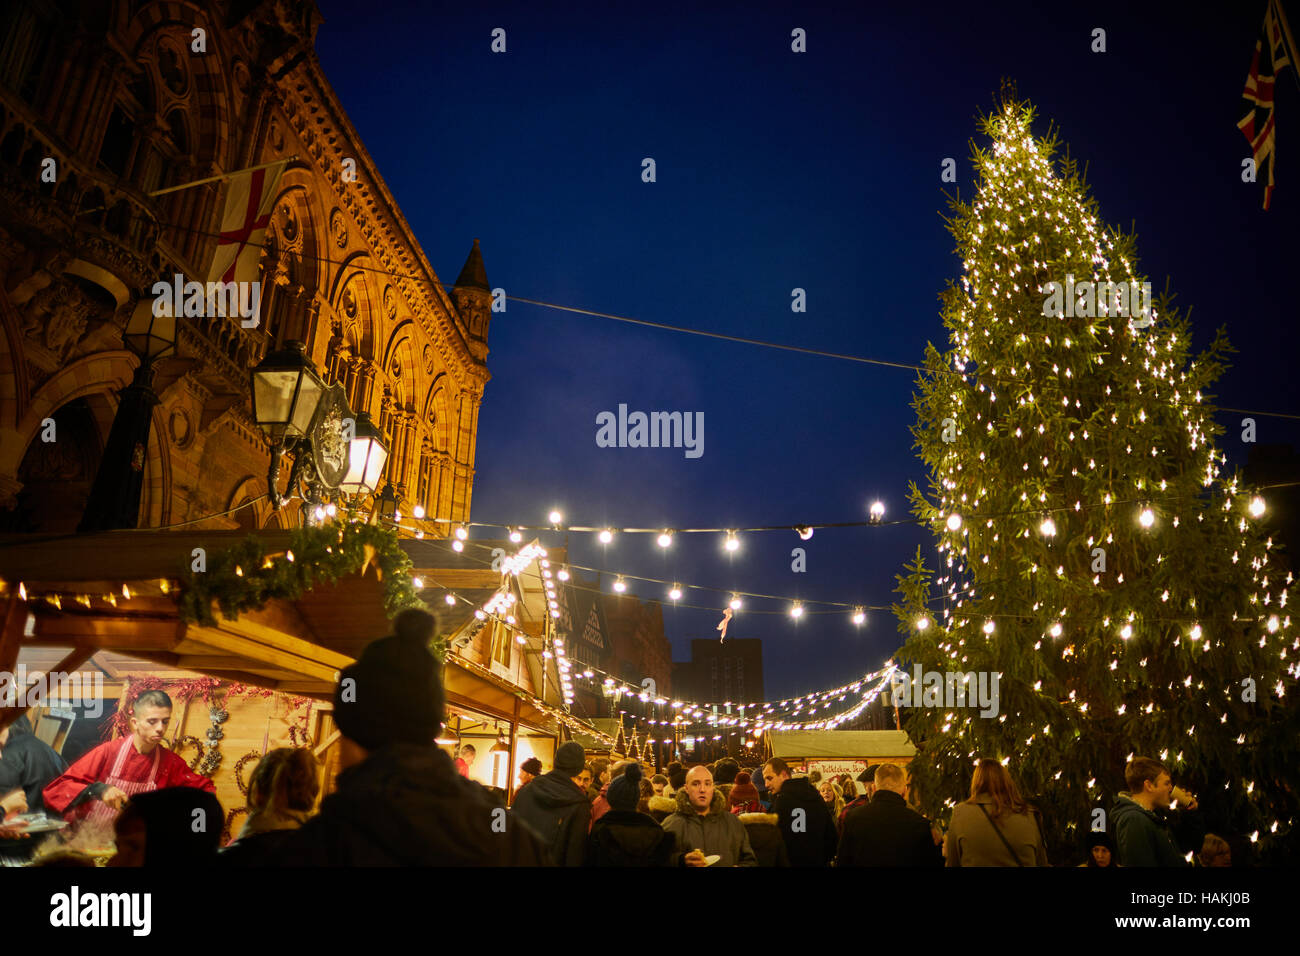 Chester German Christmas Markets Tree Town Hall Exterior Christmas Xmas  Festive Seasonal Market Stalls Gift Market Bazaar Vendor Trader Traders Ind